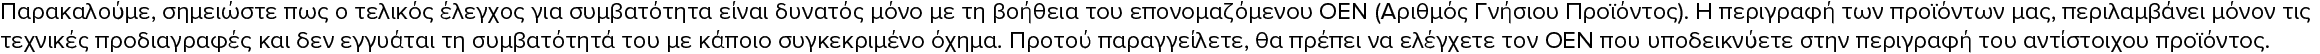 NGK 003 690 571 5E, 036 905 100, 036 905 100 A, 036 905 100 B, 036 905 100 C Πολλαπλασιαστής